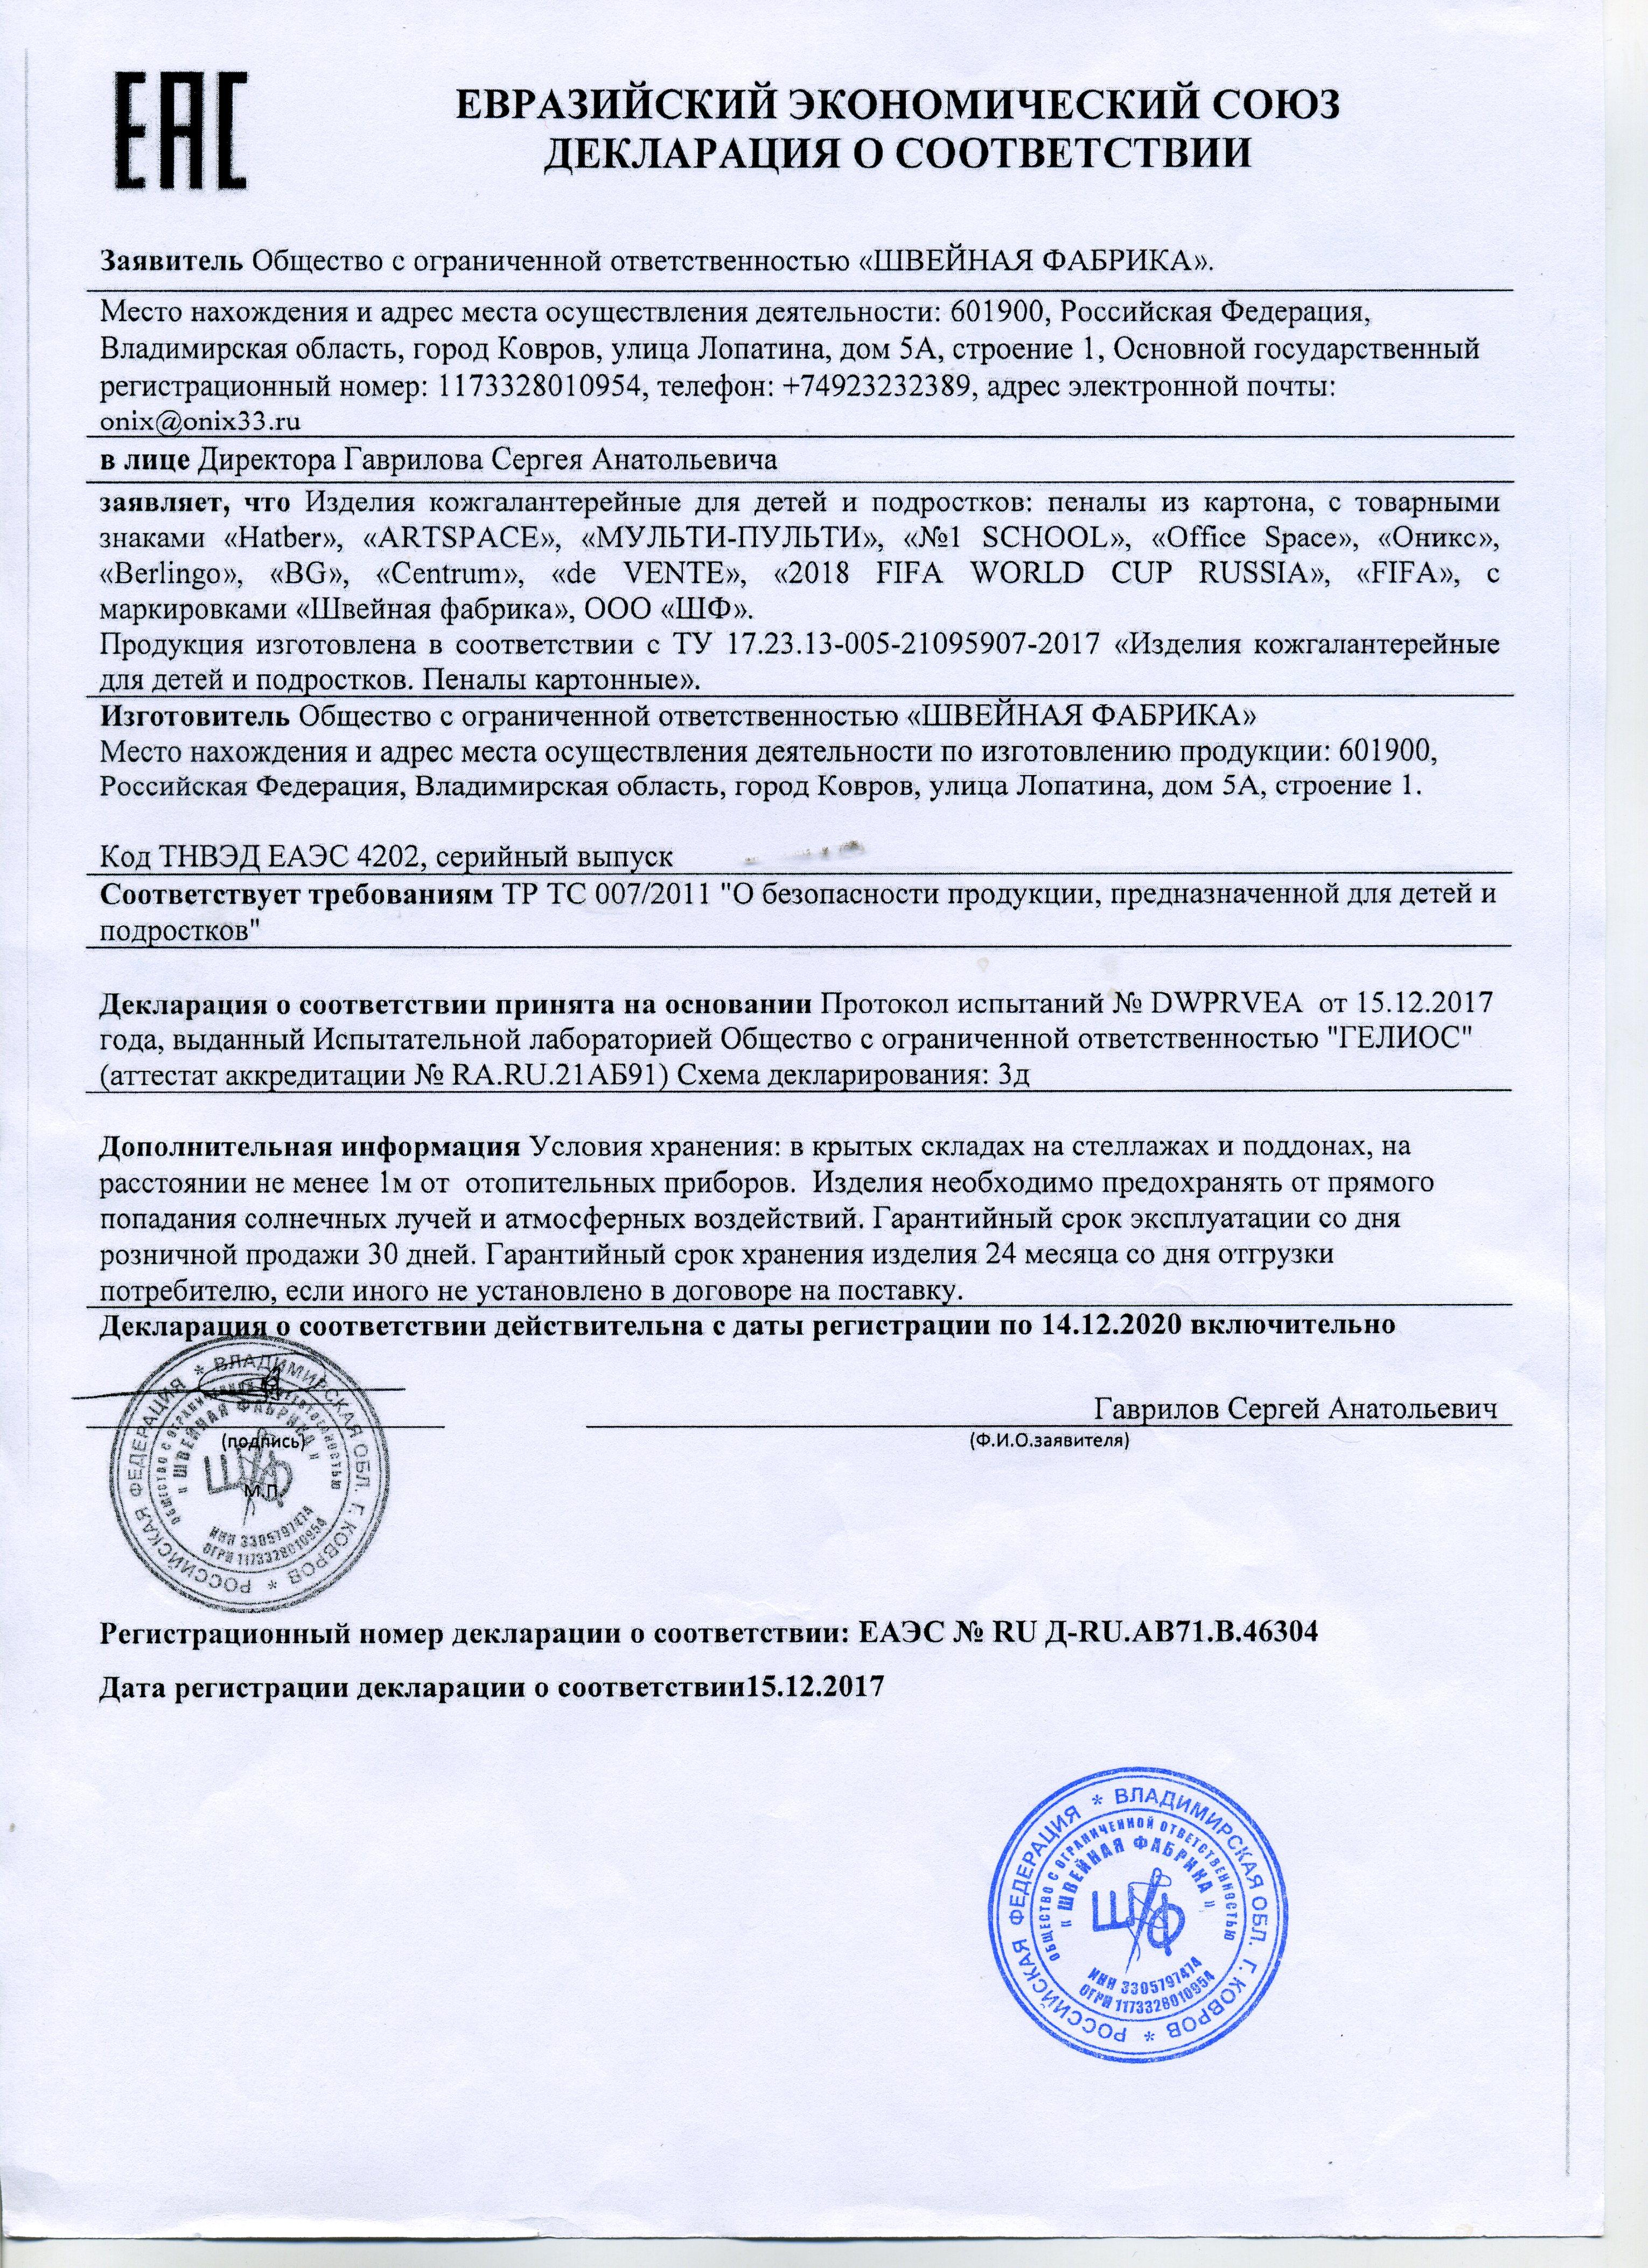 BG Пеналы (Оникс)до 14.12.20